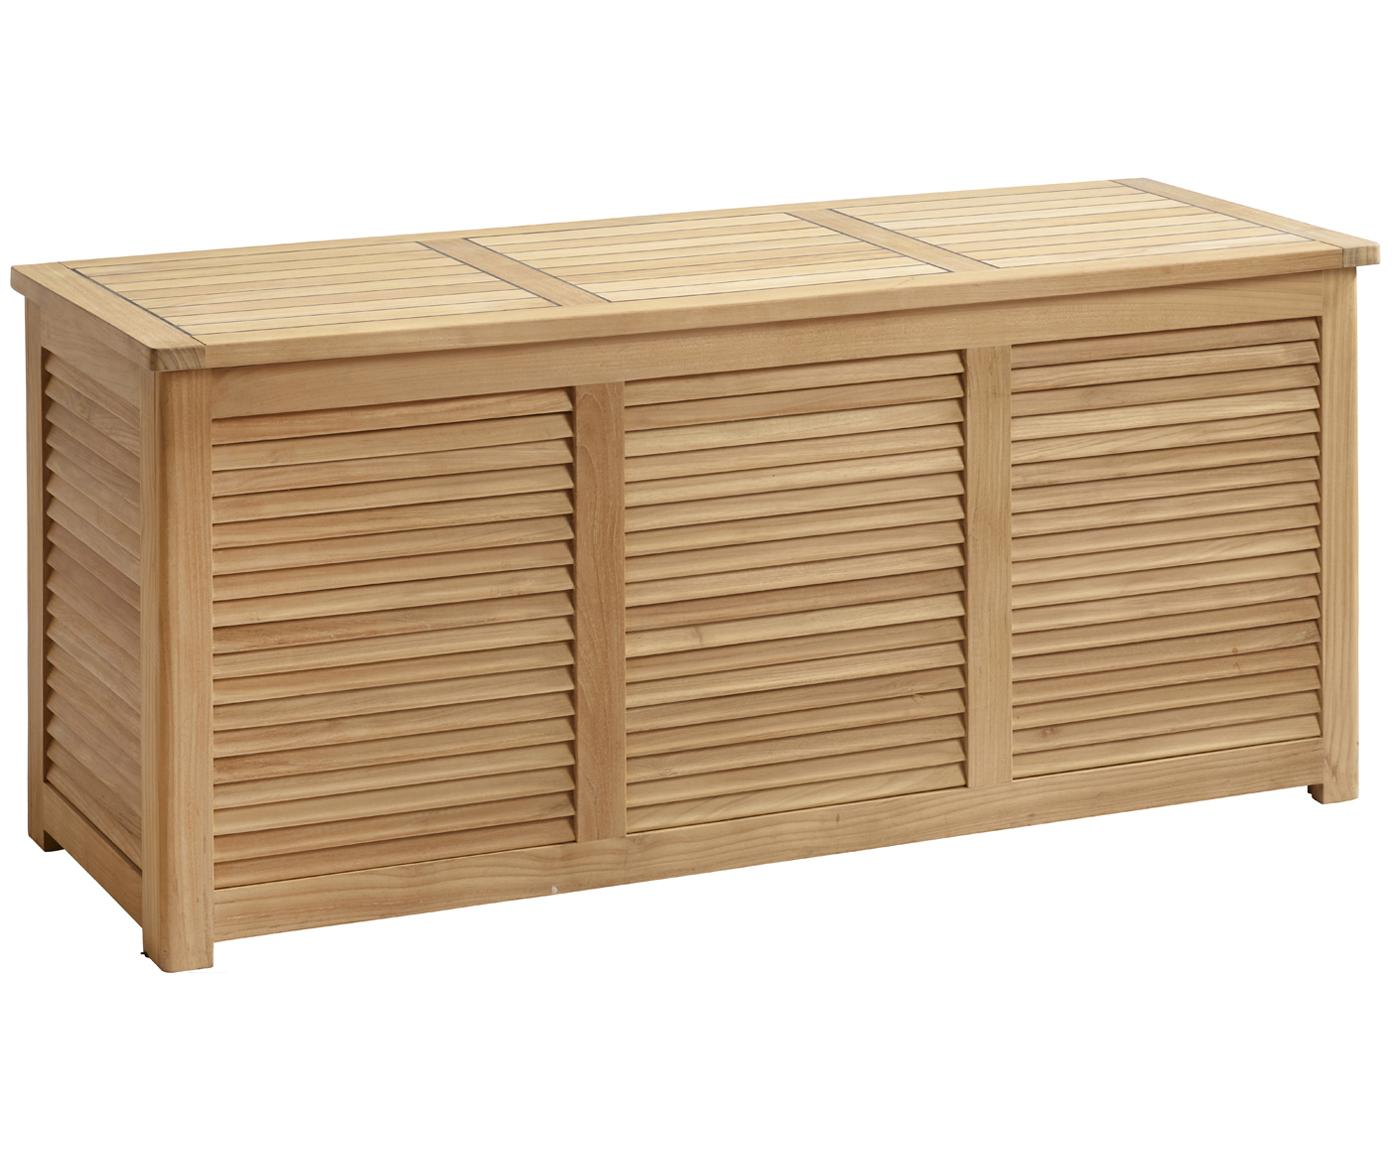 Cassapanca da giardino in legno Storage, Legno di teak, sabbiato Certificato V-legal, Teak, Larg. 130 x Alt. 60 cm